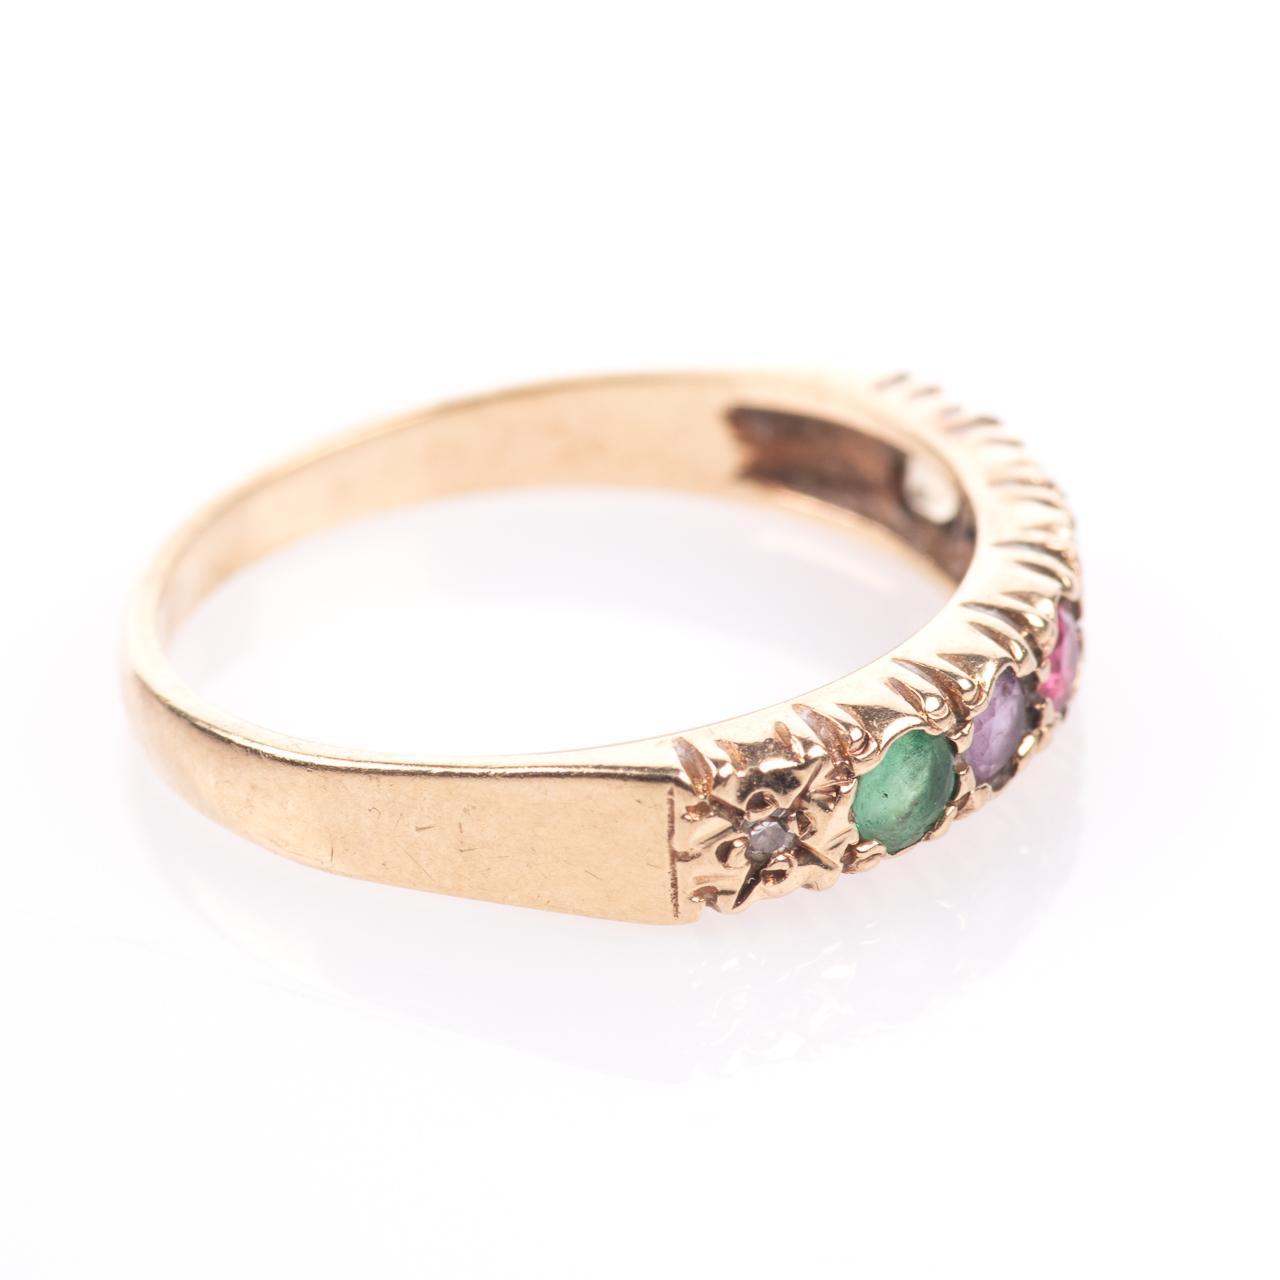 9ct Gold Emerald, Ruby, Amethyst, Sapphire & Diamond Ring - Image 8 of 8